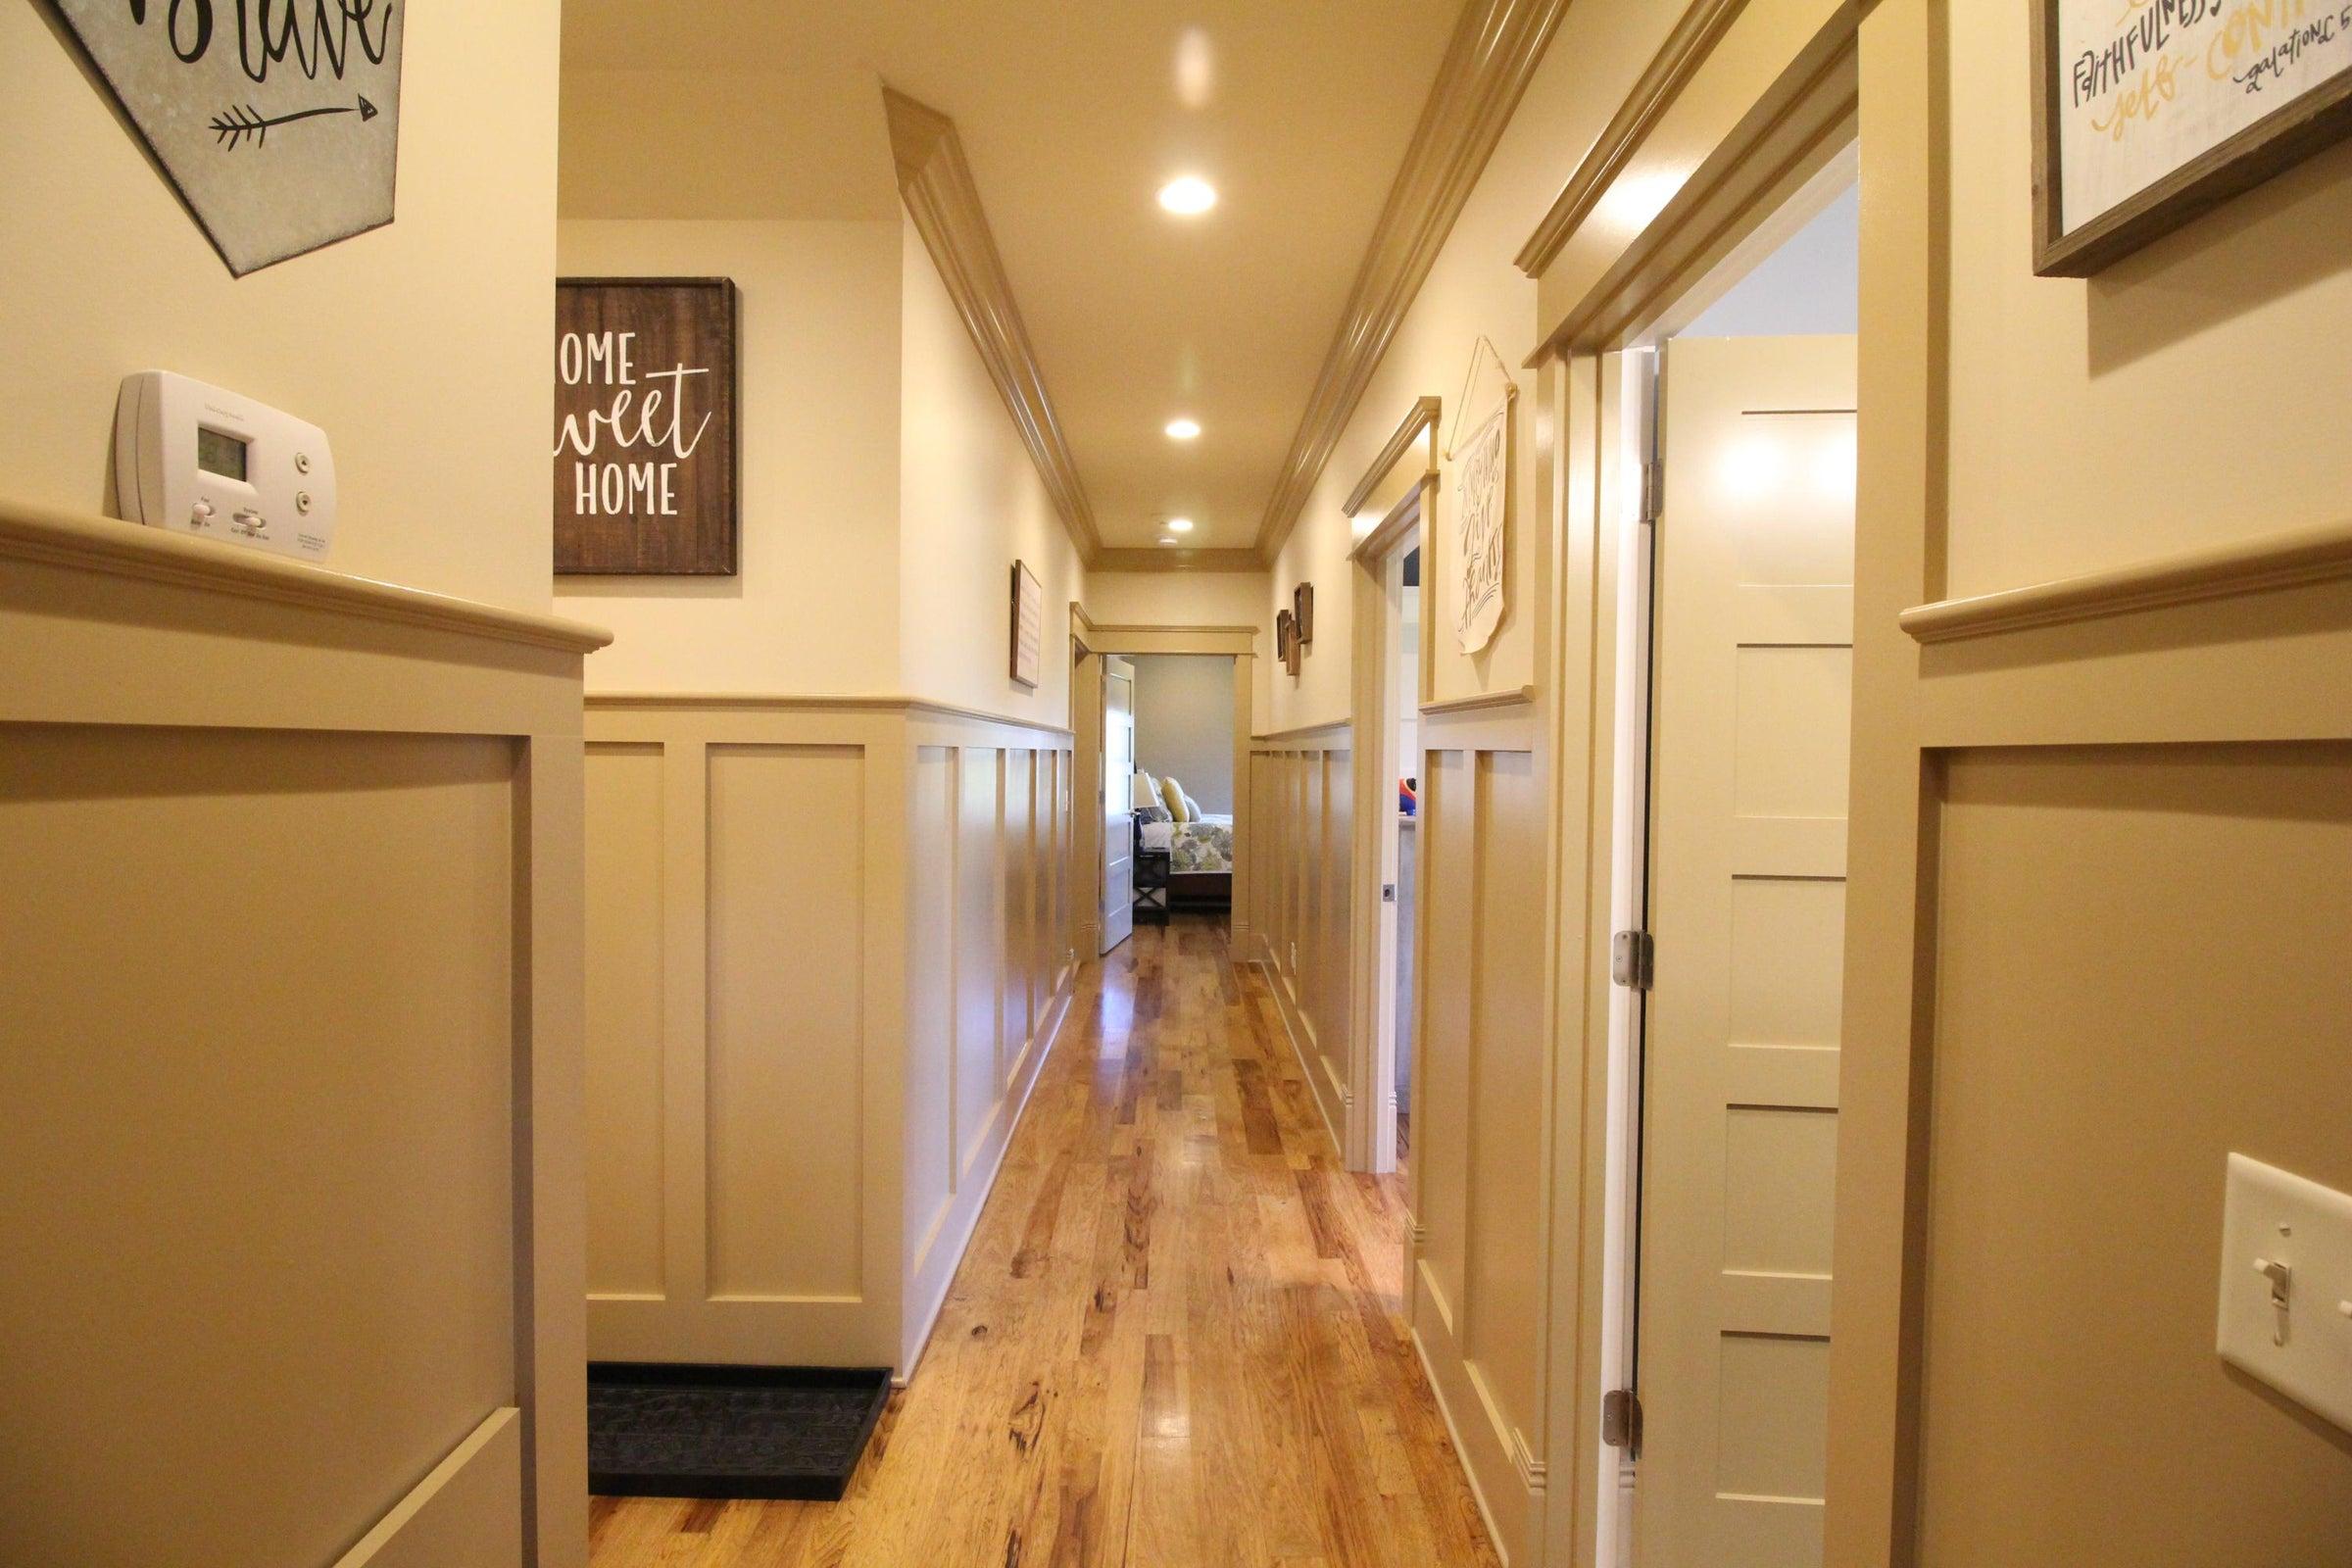 Even the hallway is elegant!